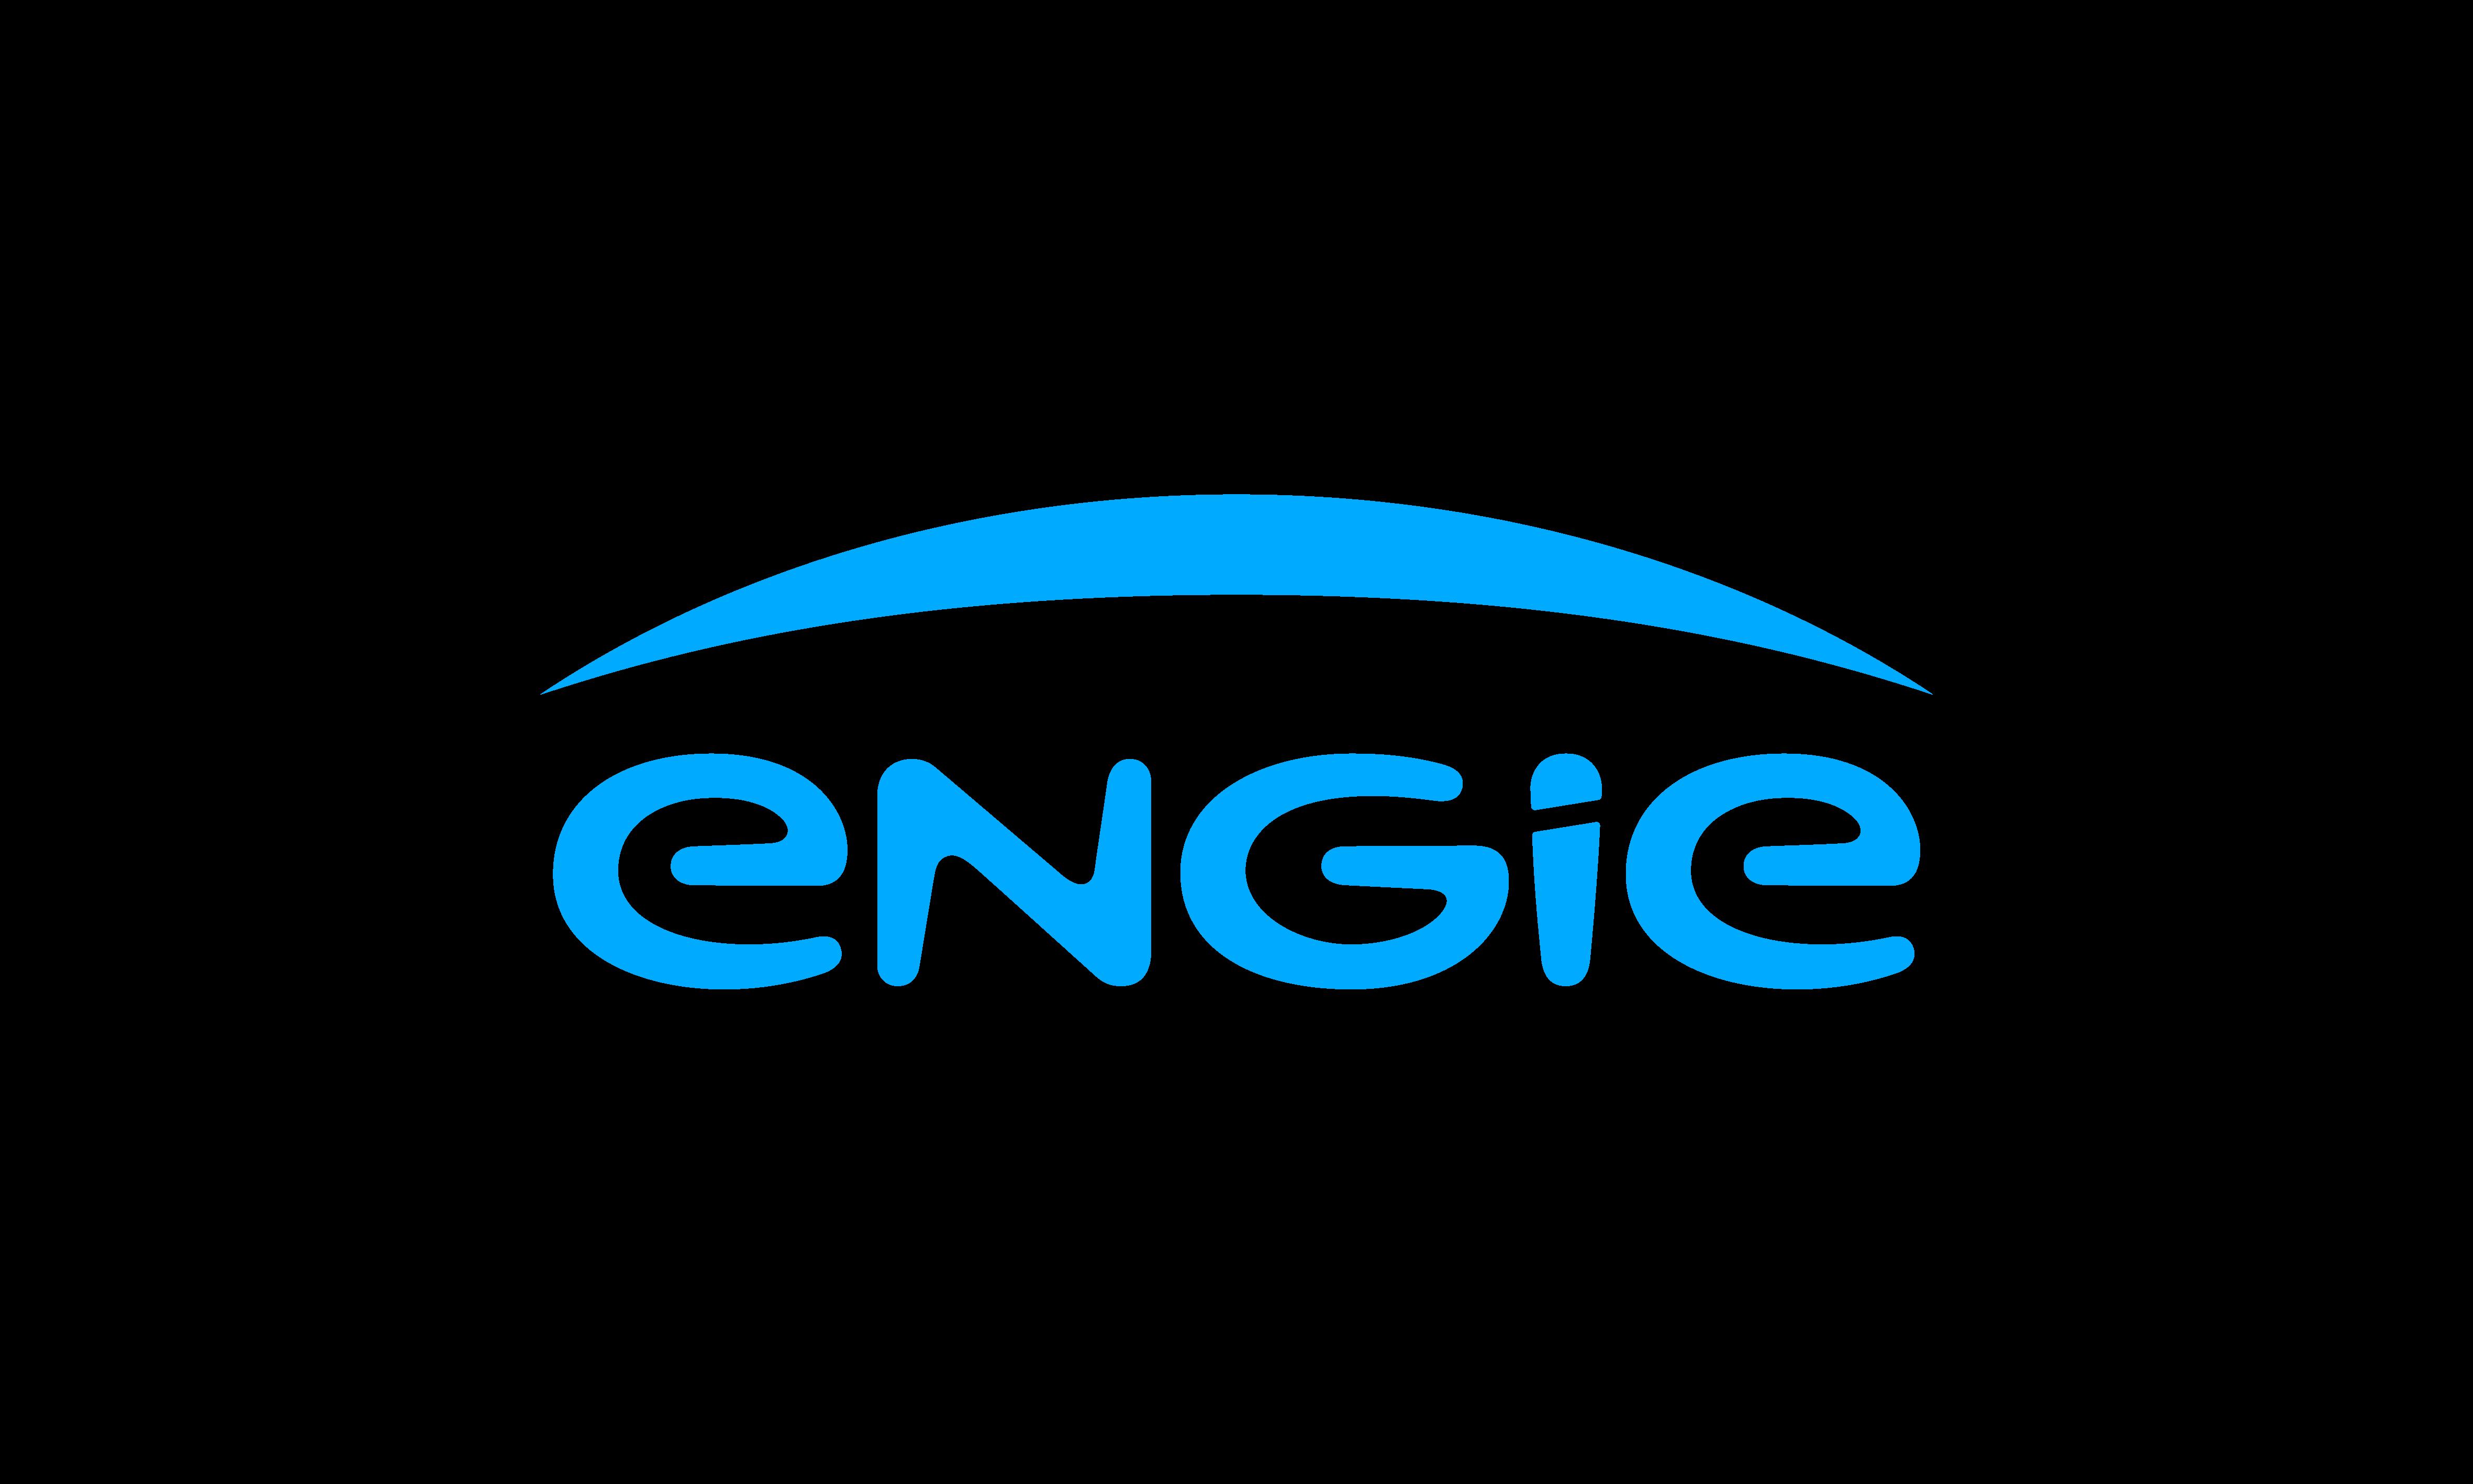 engie_logo_blue